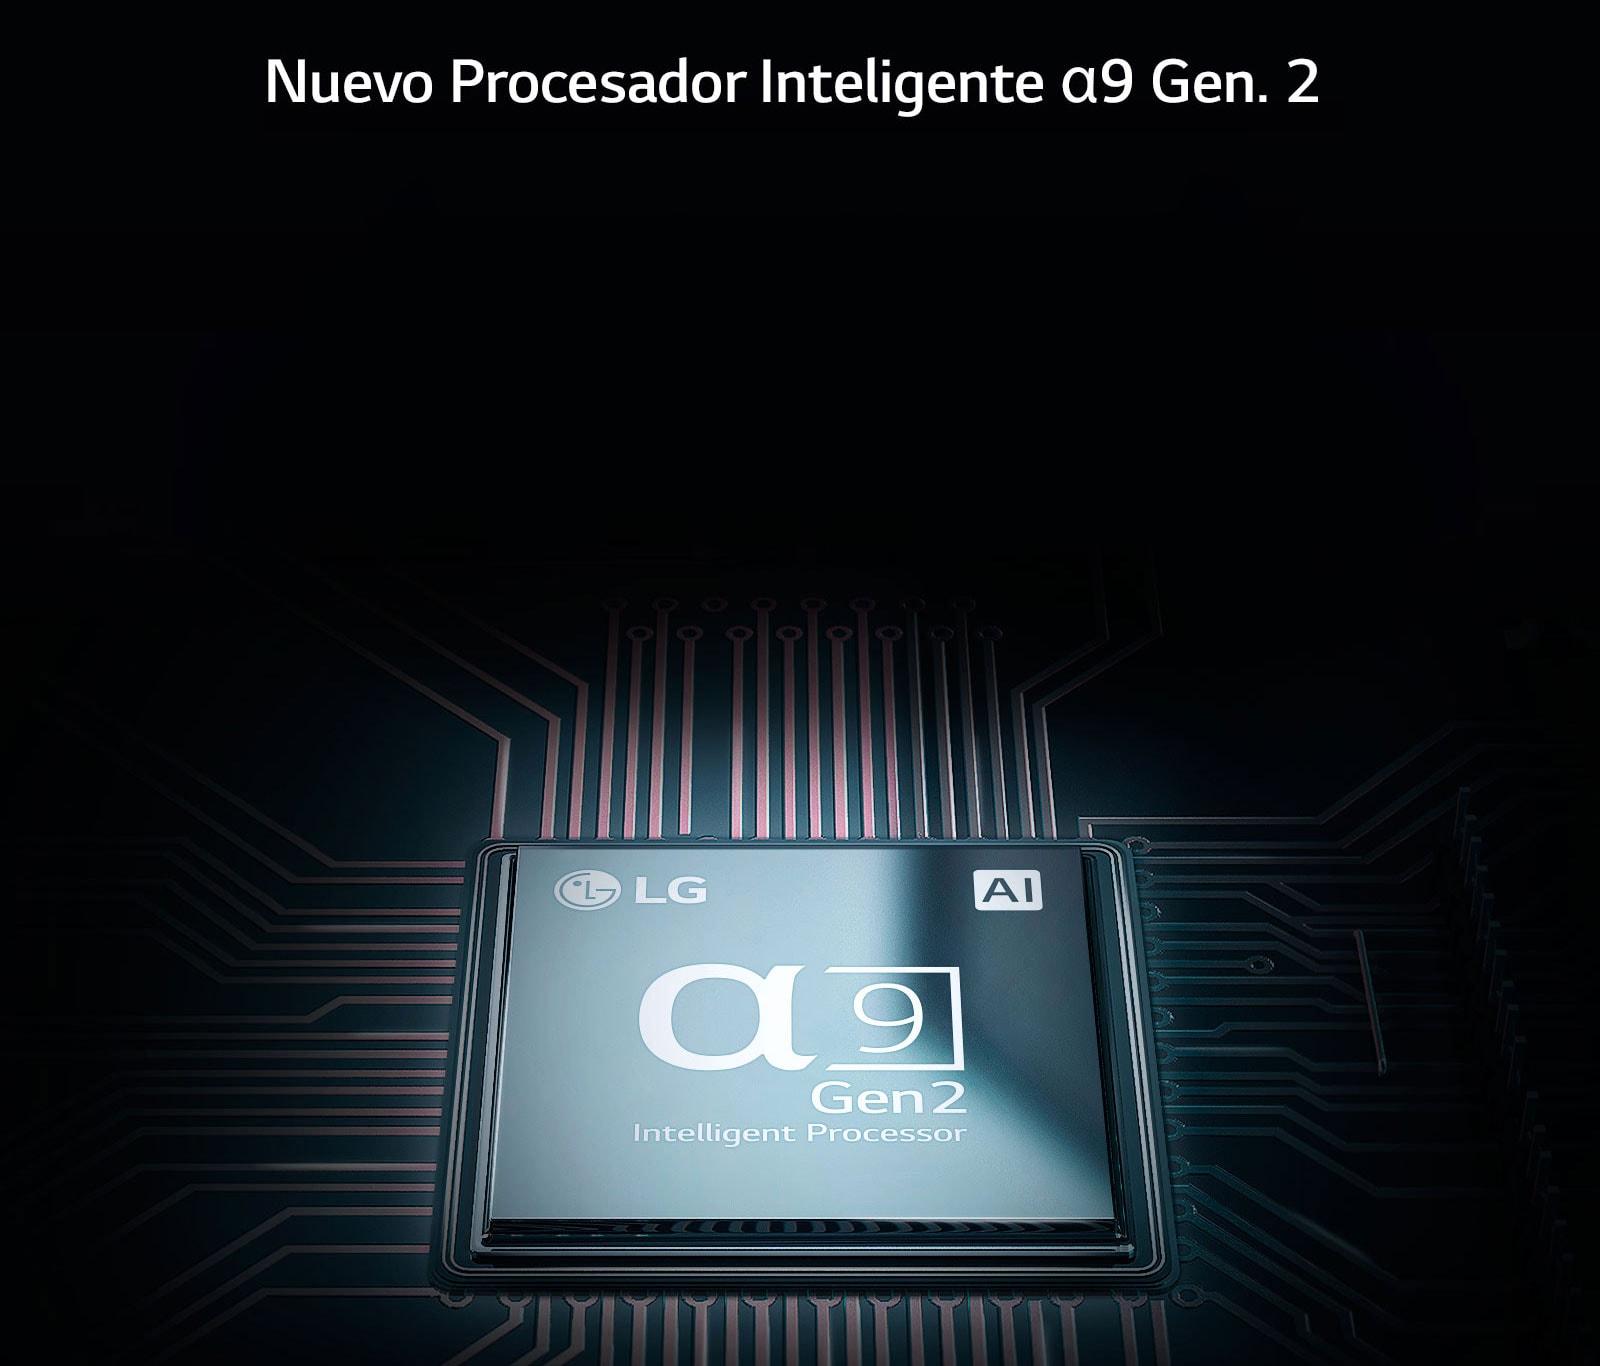 TV-OLED-C9-01-Alpha9-Gen-2-Desktop_02